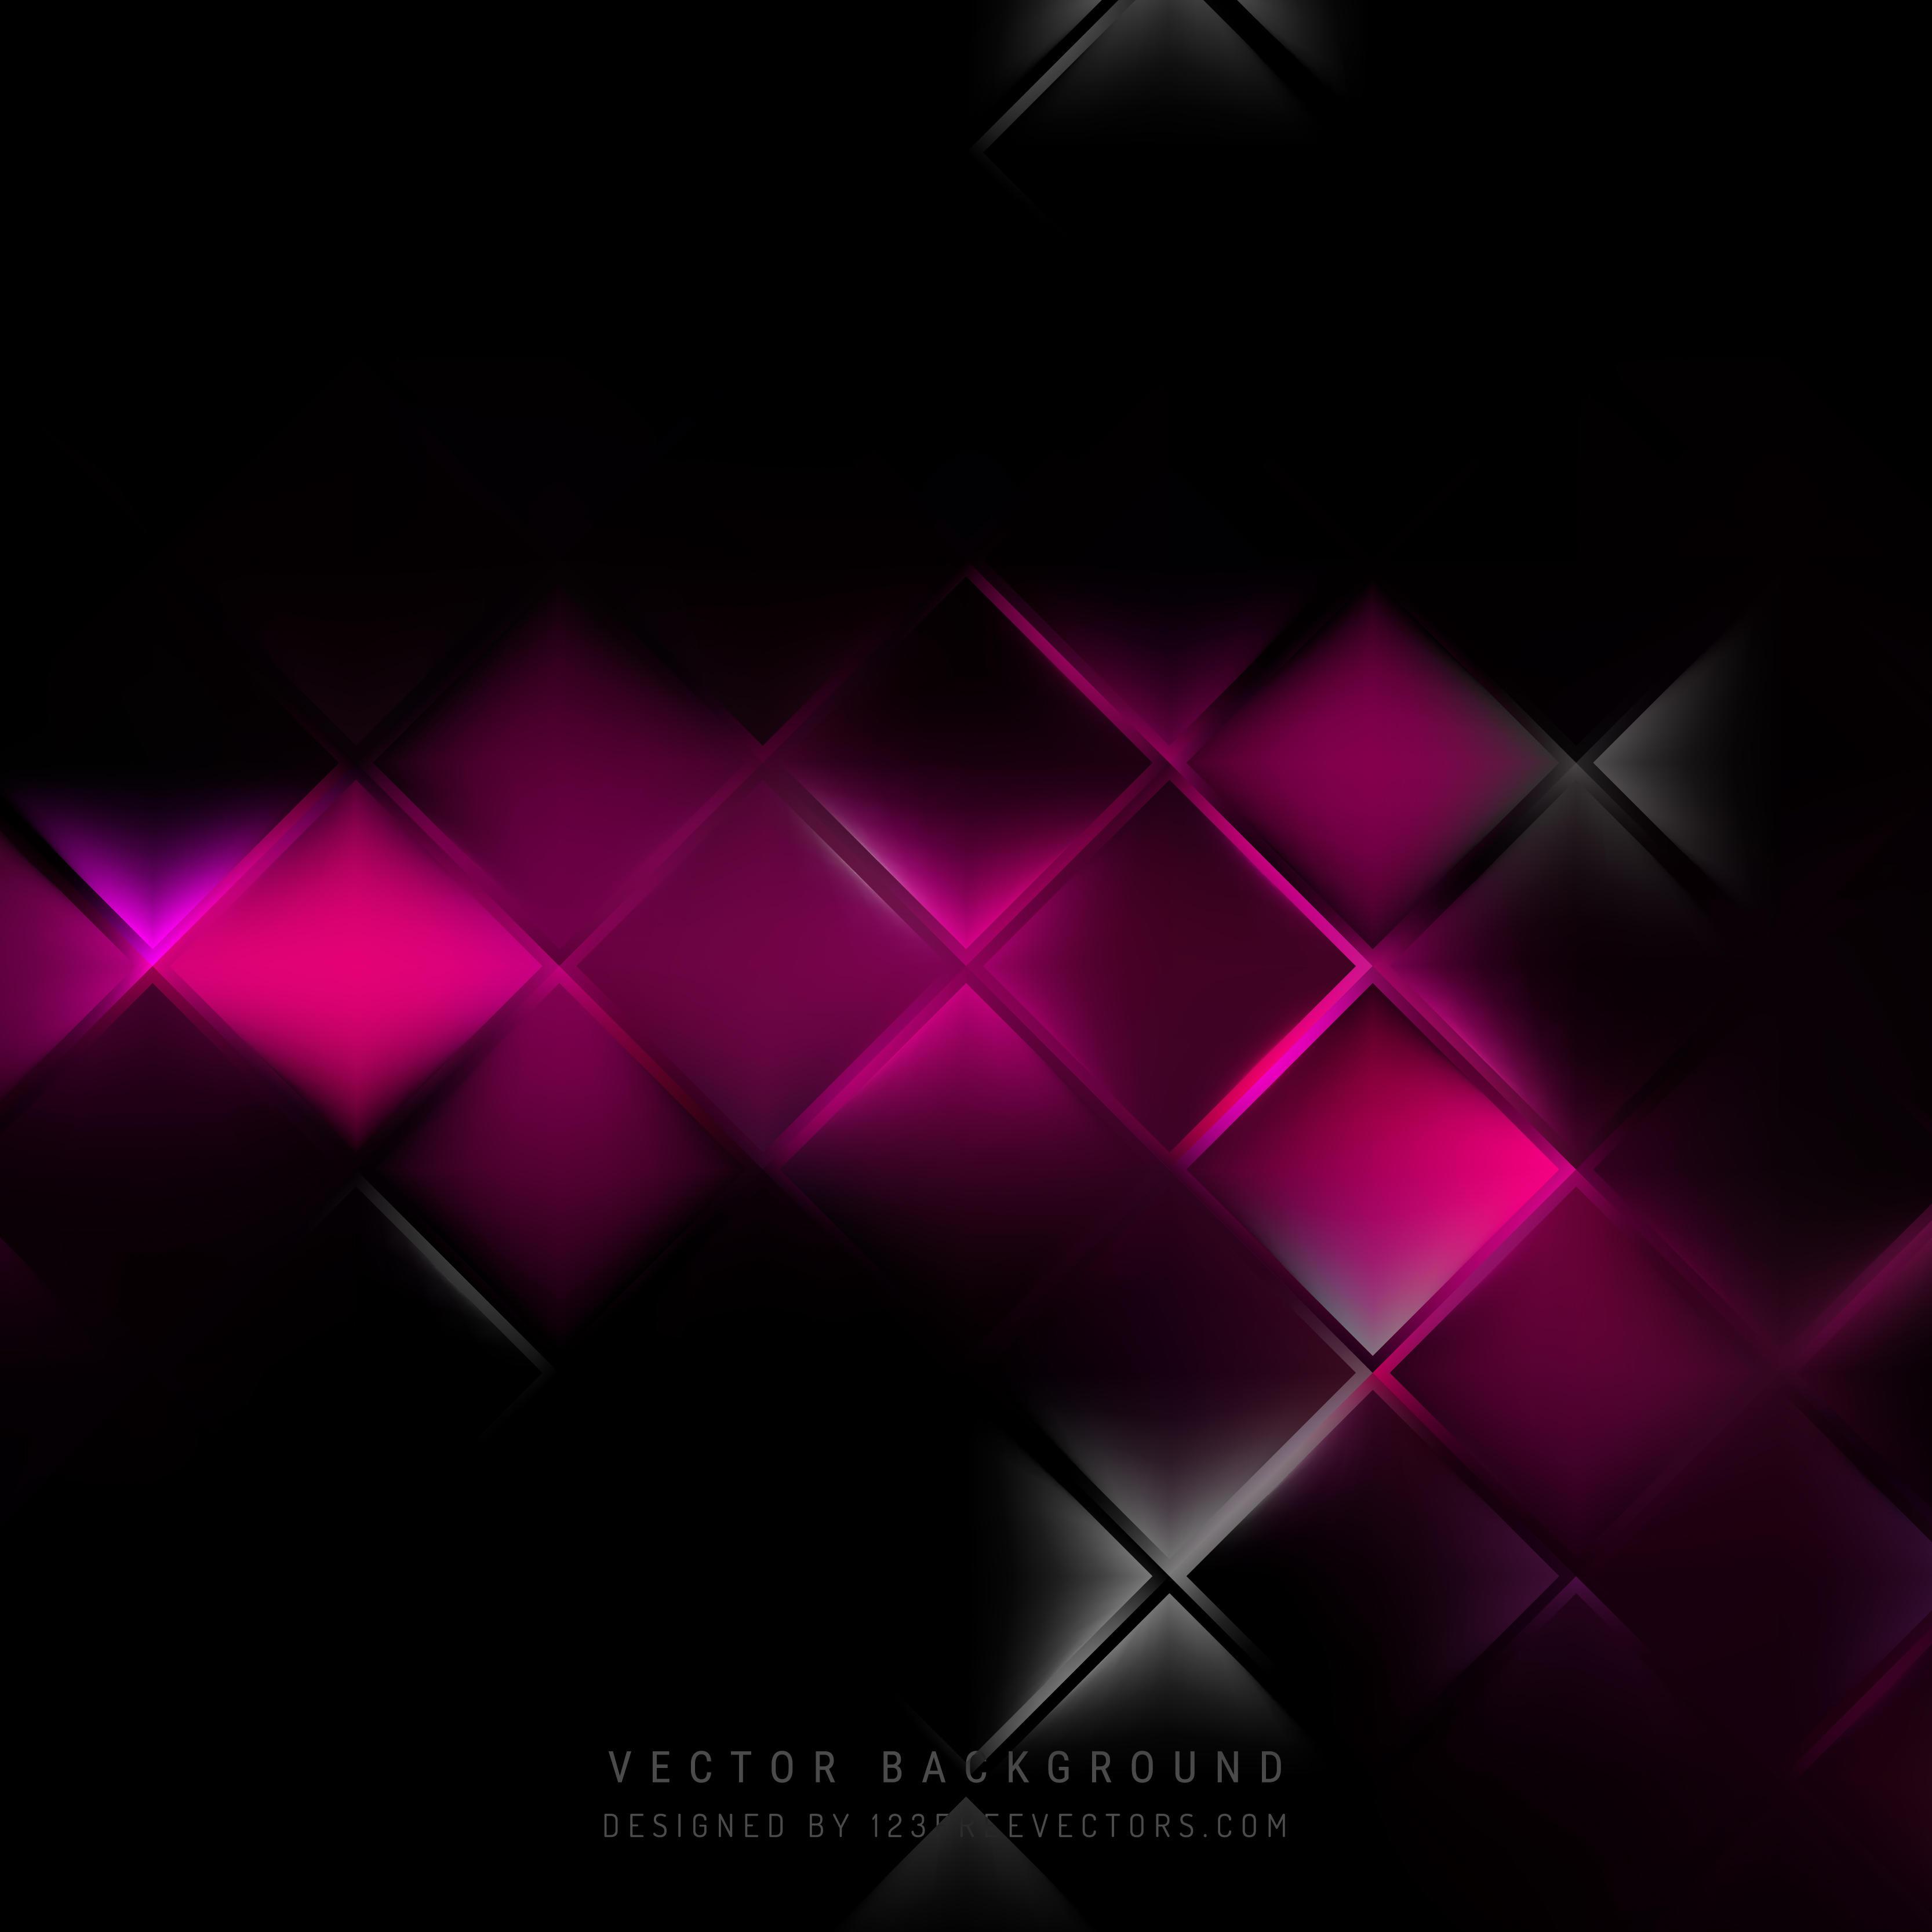 Wallpaper Black Pink: Abstract Black Pink Square Background Design